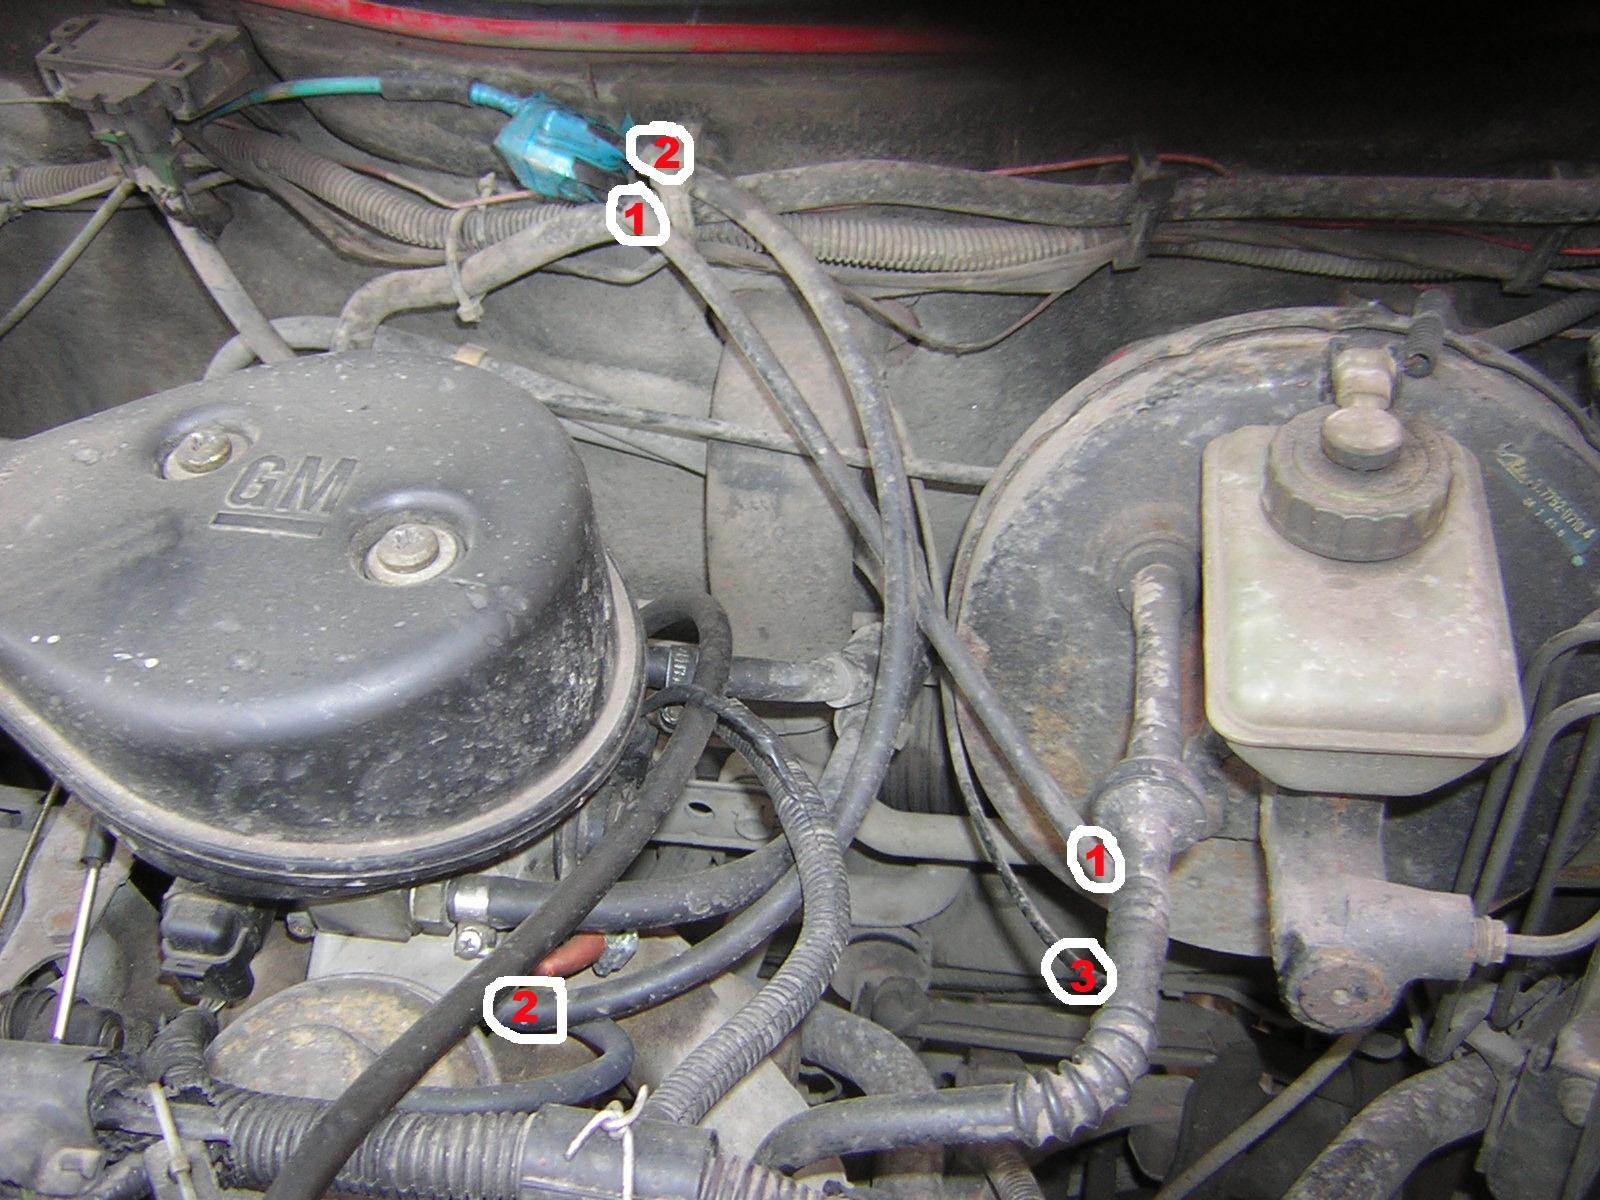 opel vectra b вентиляционный клапан топливного бака